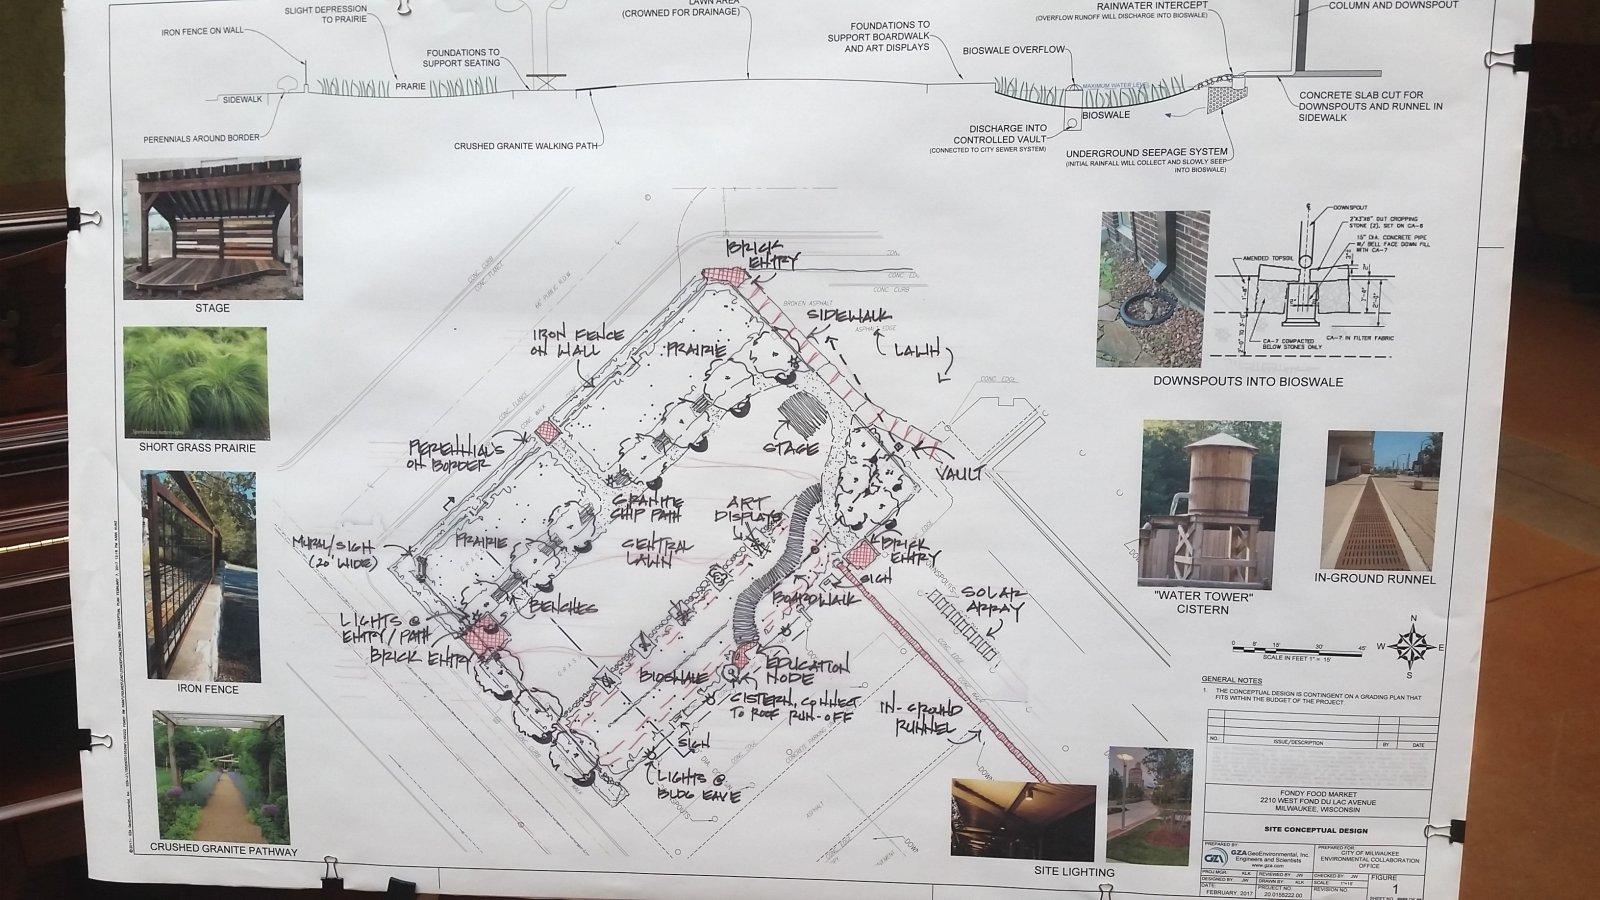 Fond Park Site Plan